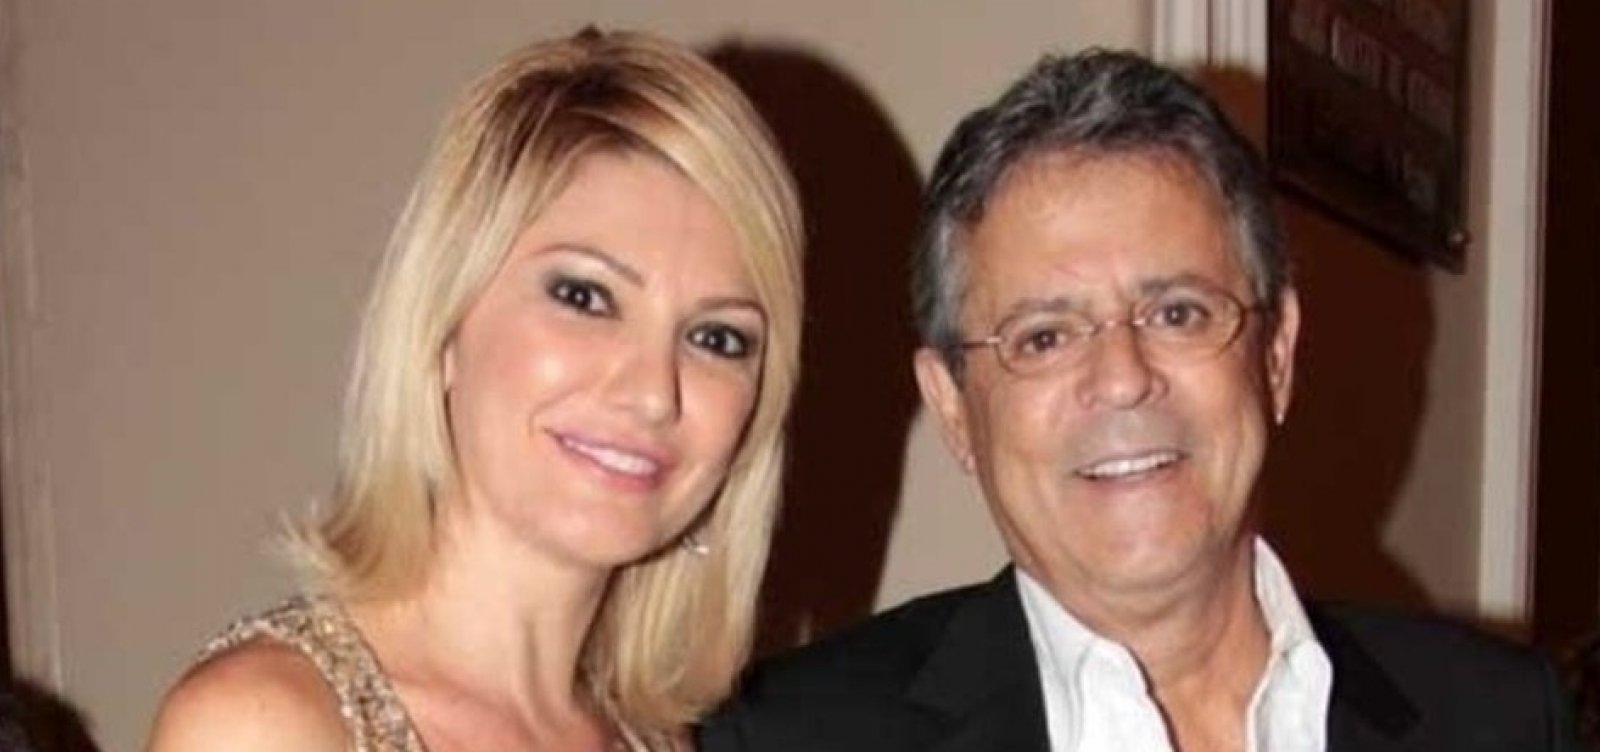 ['O Marcos Paulo era alcoólatra', desbafa Antonia Fontenelle sobre o ex-marido morto em 2012 ]